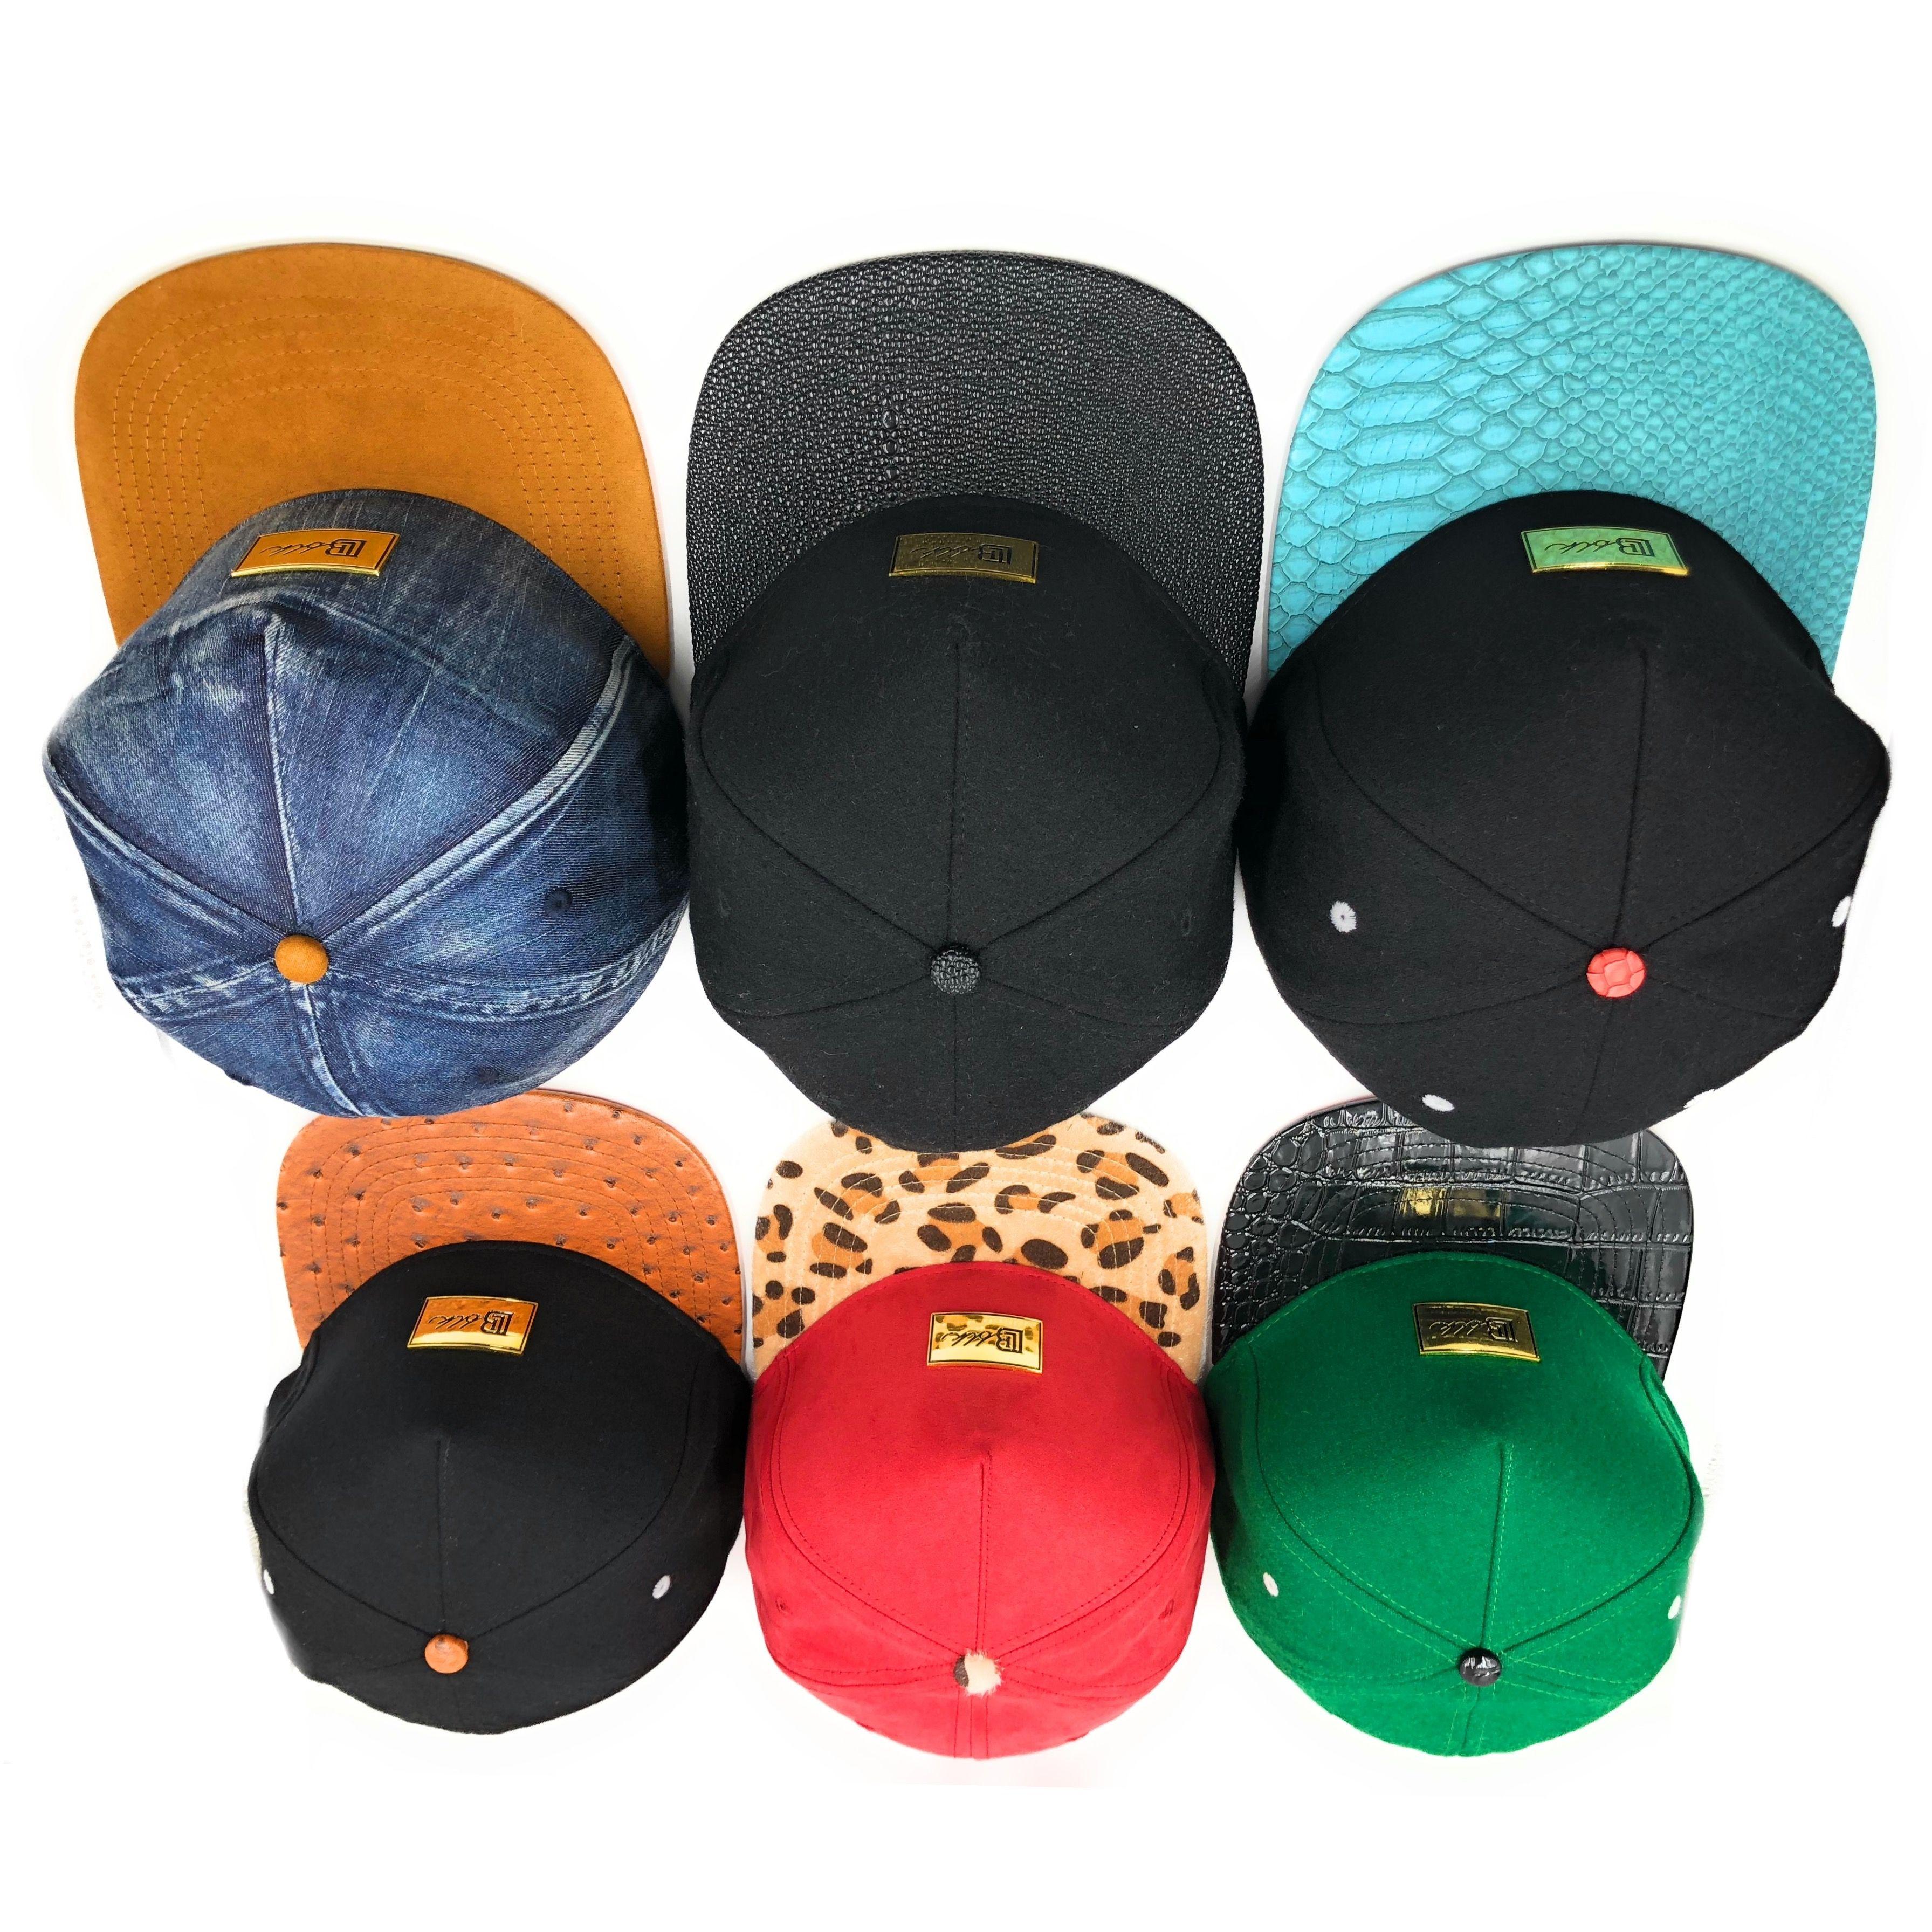 Crab Unisex Adult Hats Classic Baseball Caps Sports Hat Peaked Cap Gray